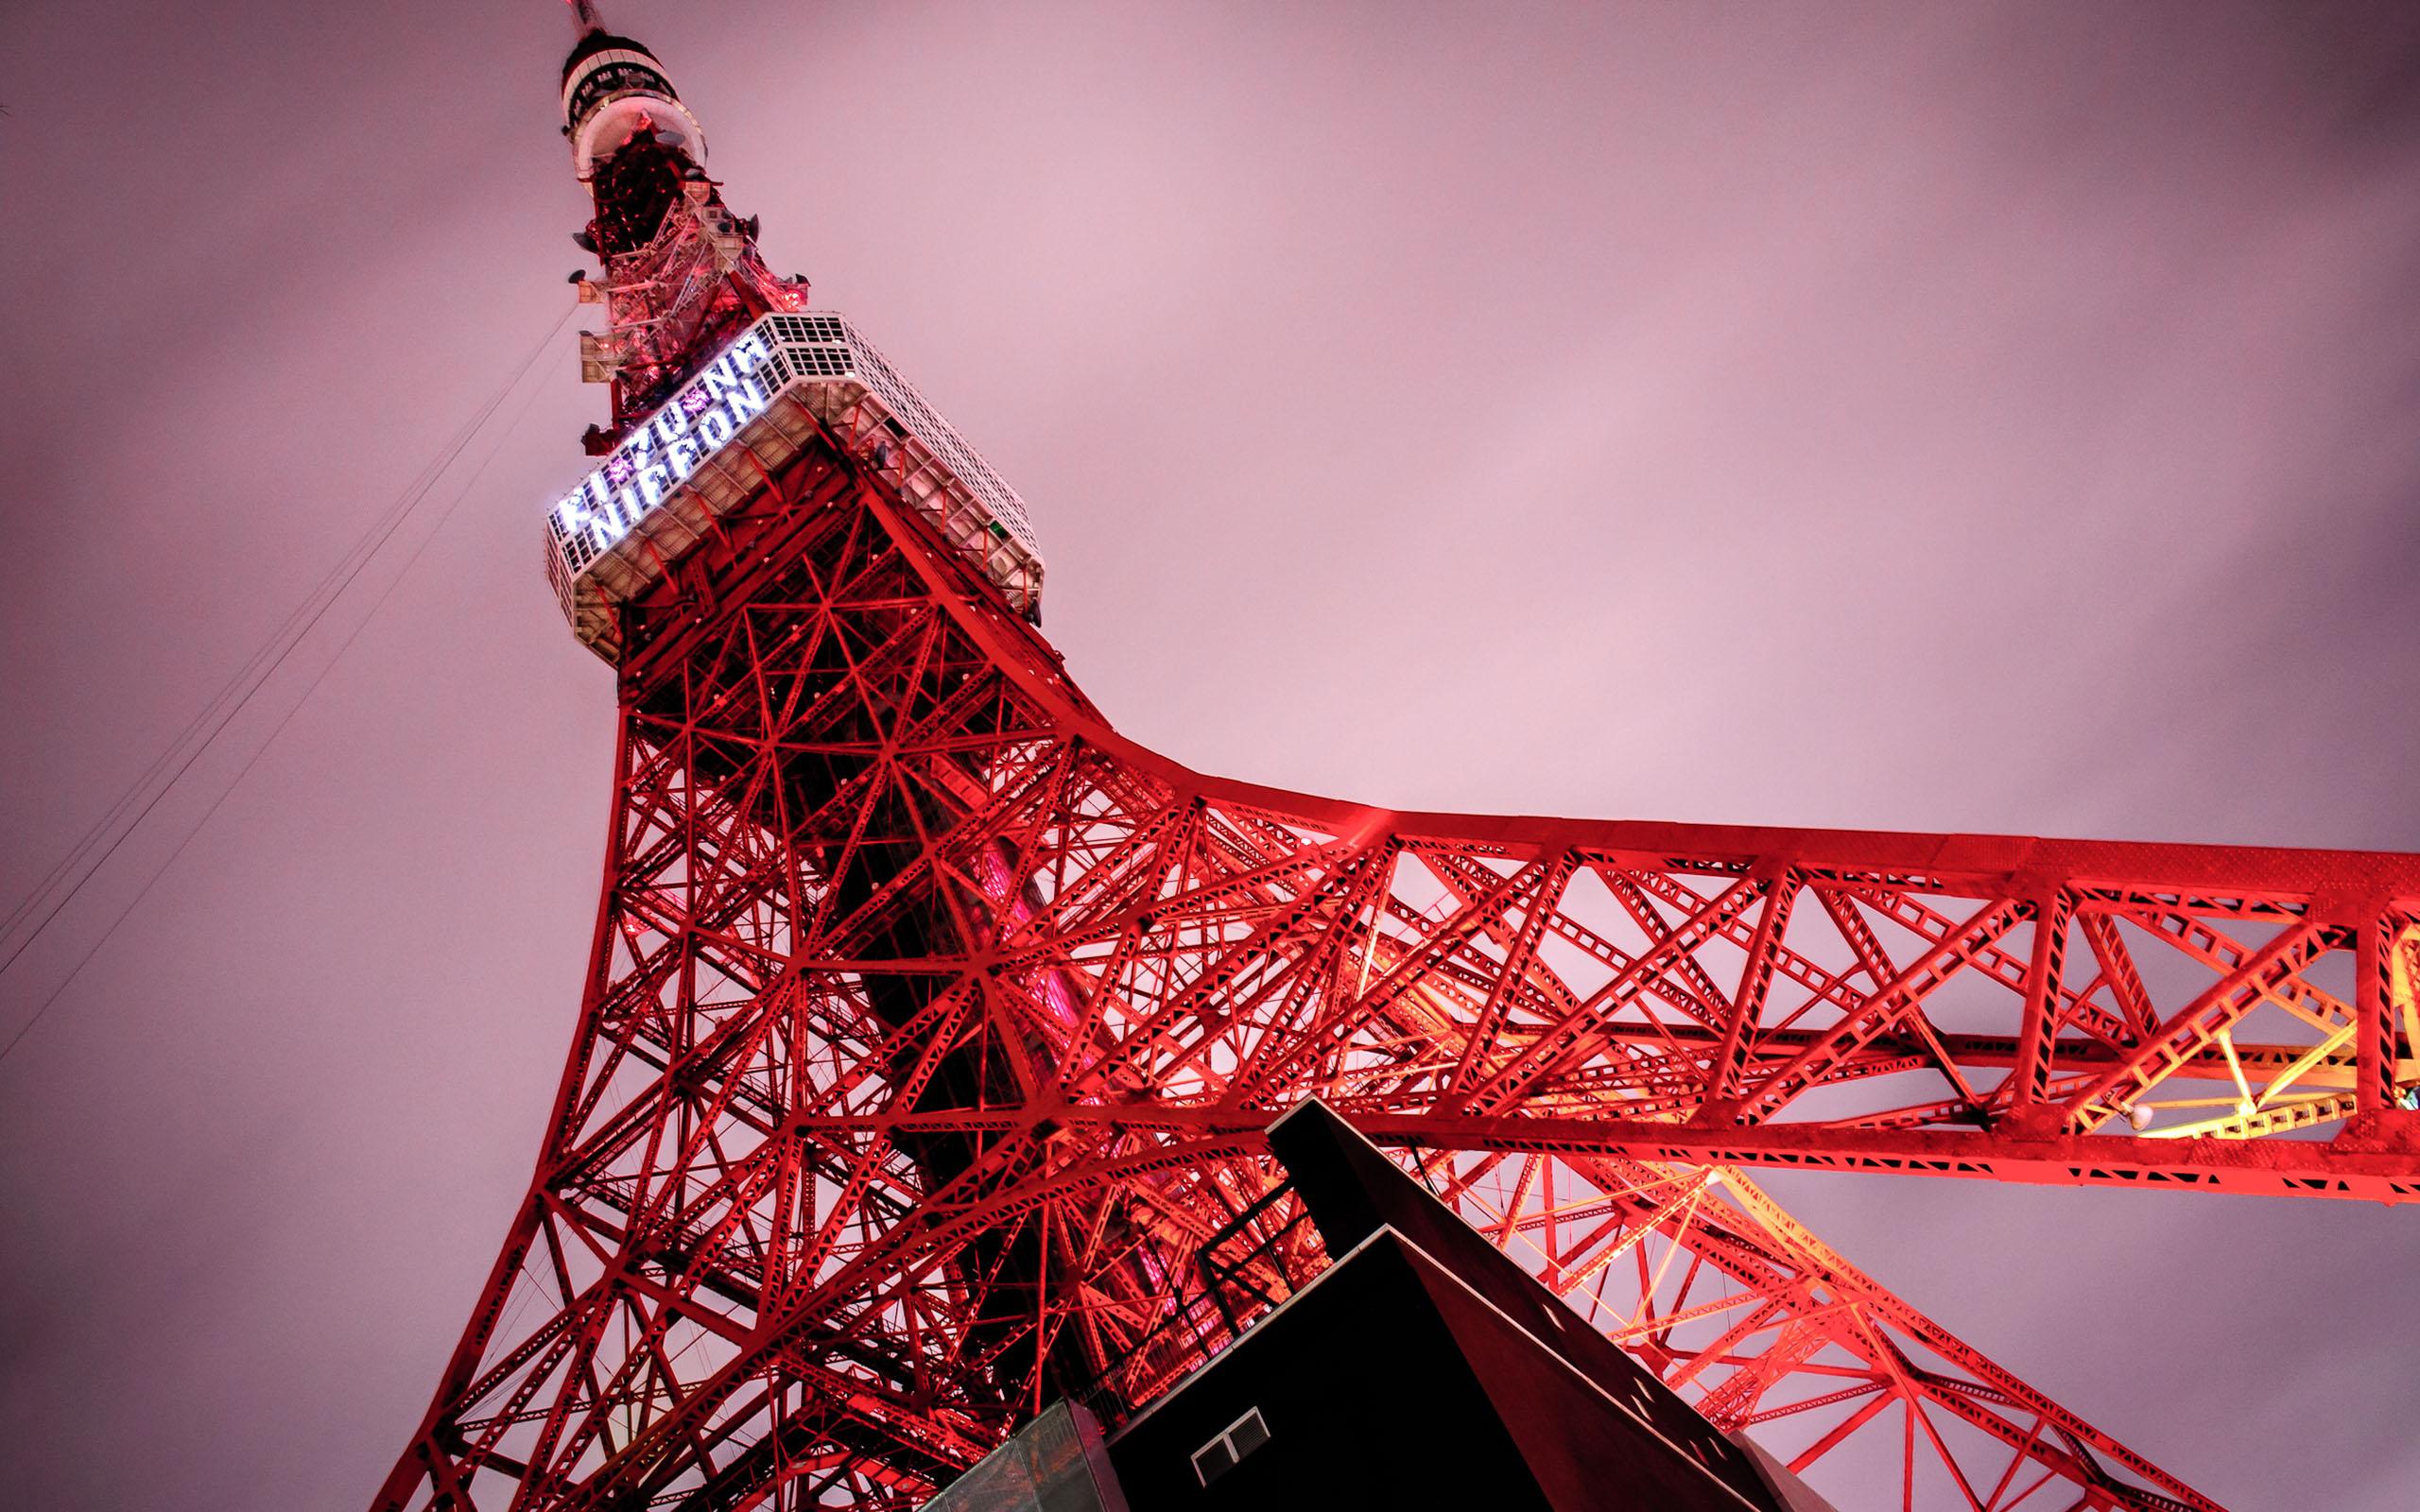 Tokyo Tower Tokyo Japan Wallpaper Faxo Faxo